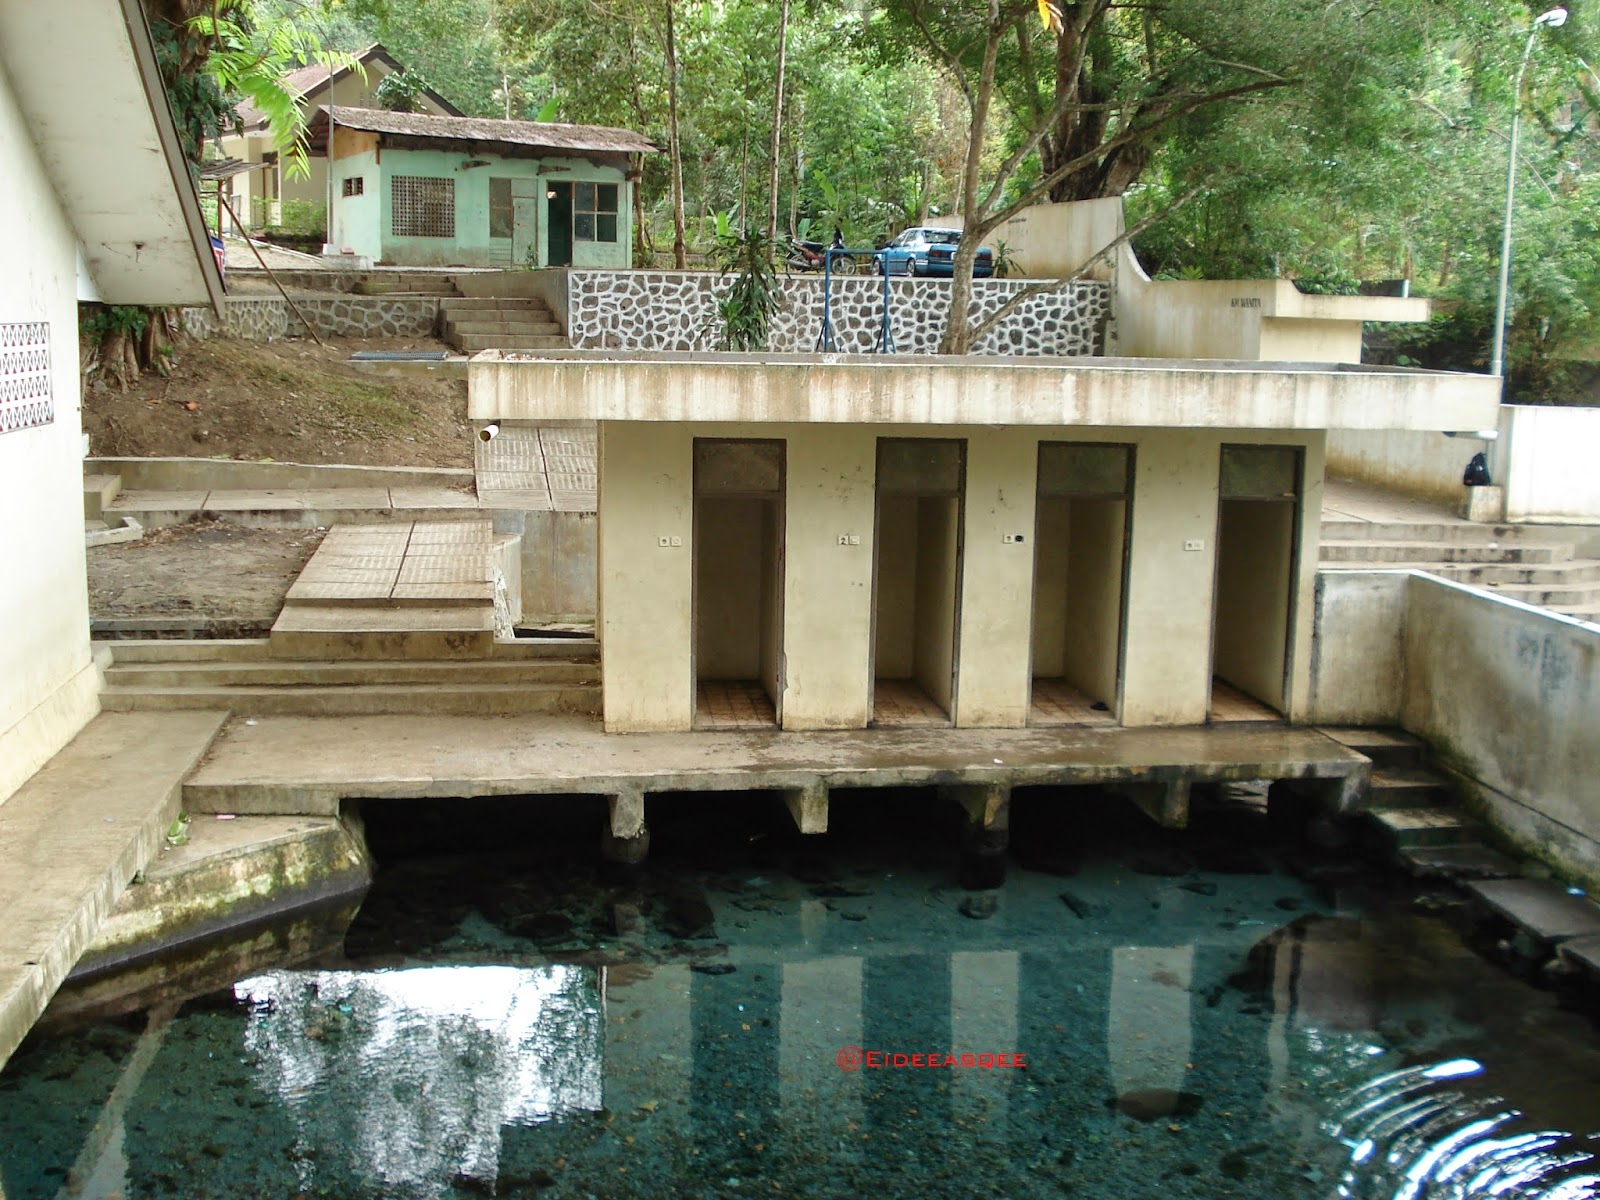 Gending Dusun Ganjuran River Springs Tirta Raya Ce Tek Tempat